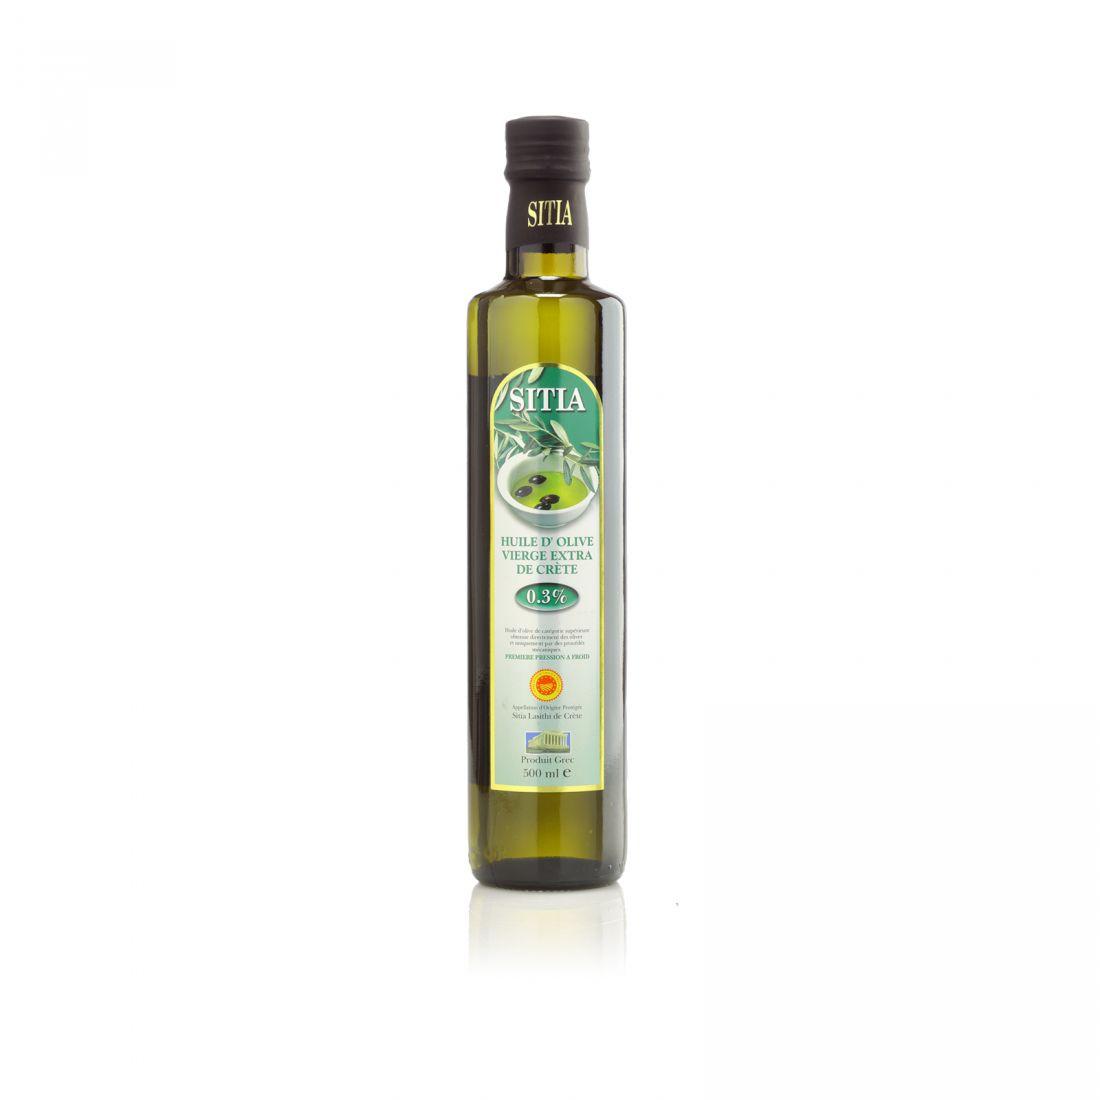 Оливковое масло SITIA - 500 мл 0.3 экстра вирджин PDO стекло